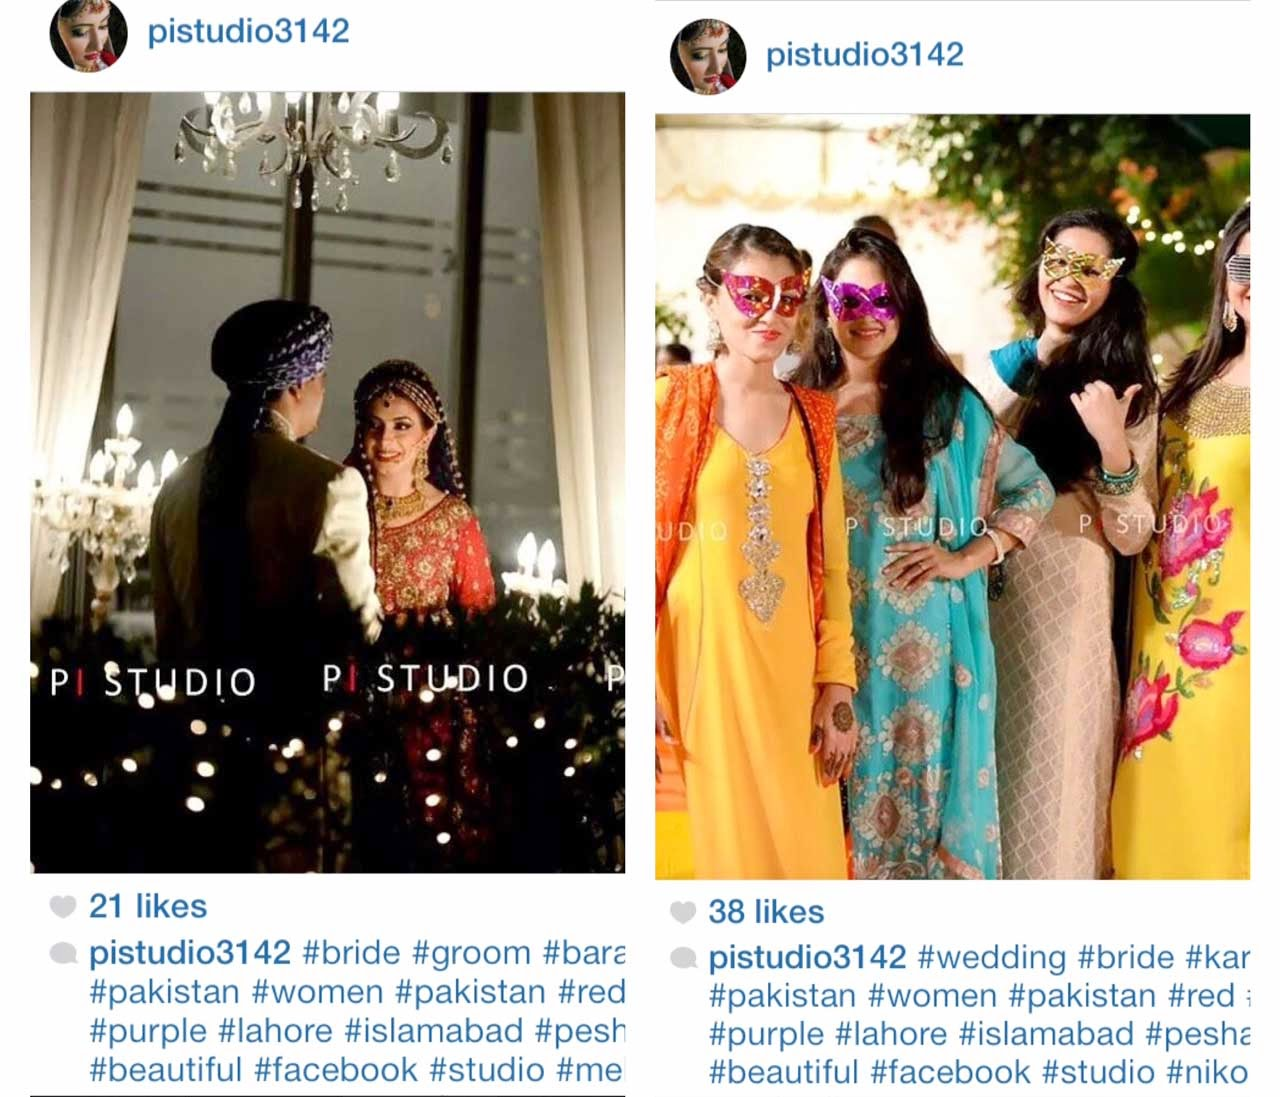 Pi Studio - Pakistan Instagram Accounts